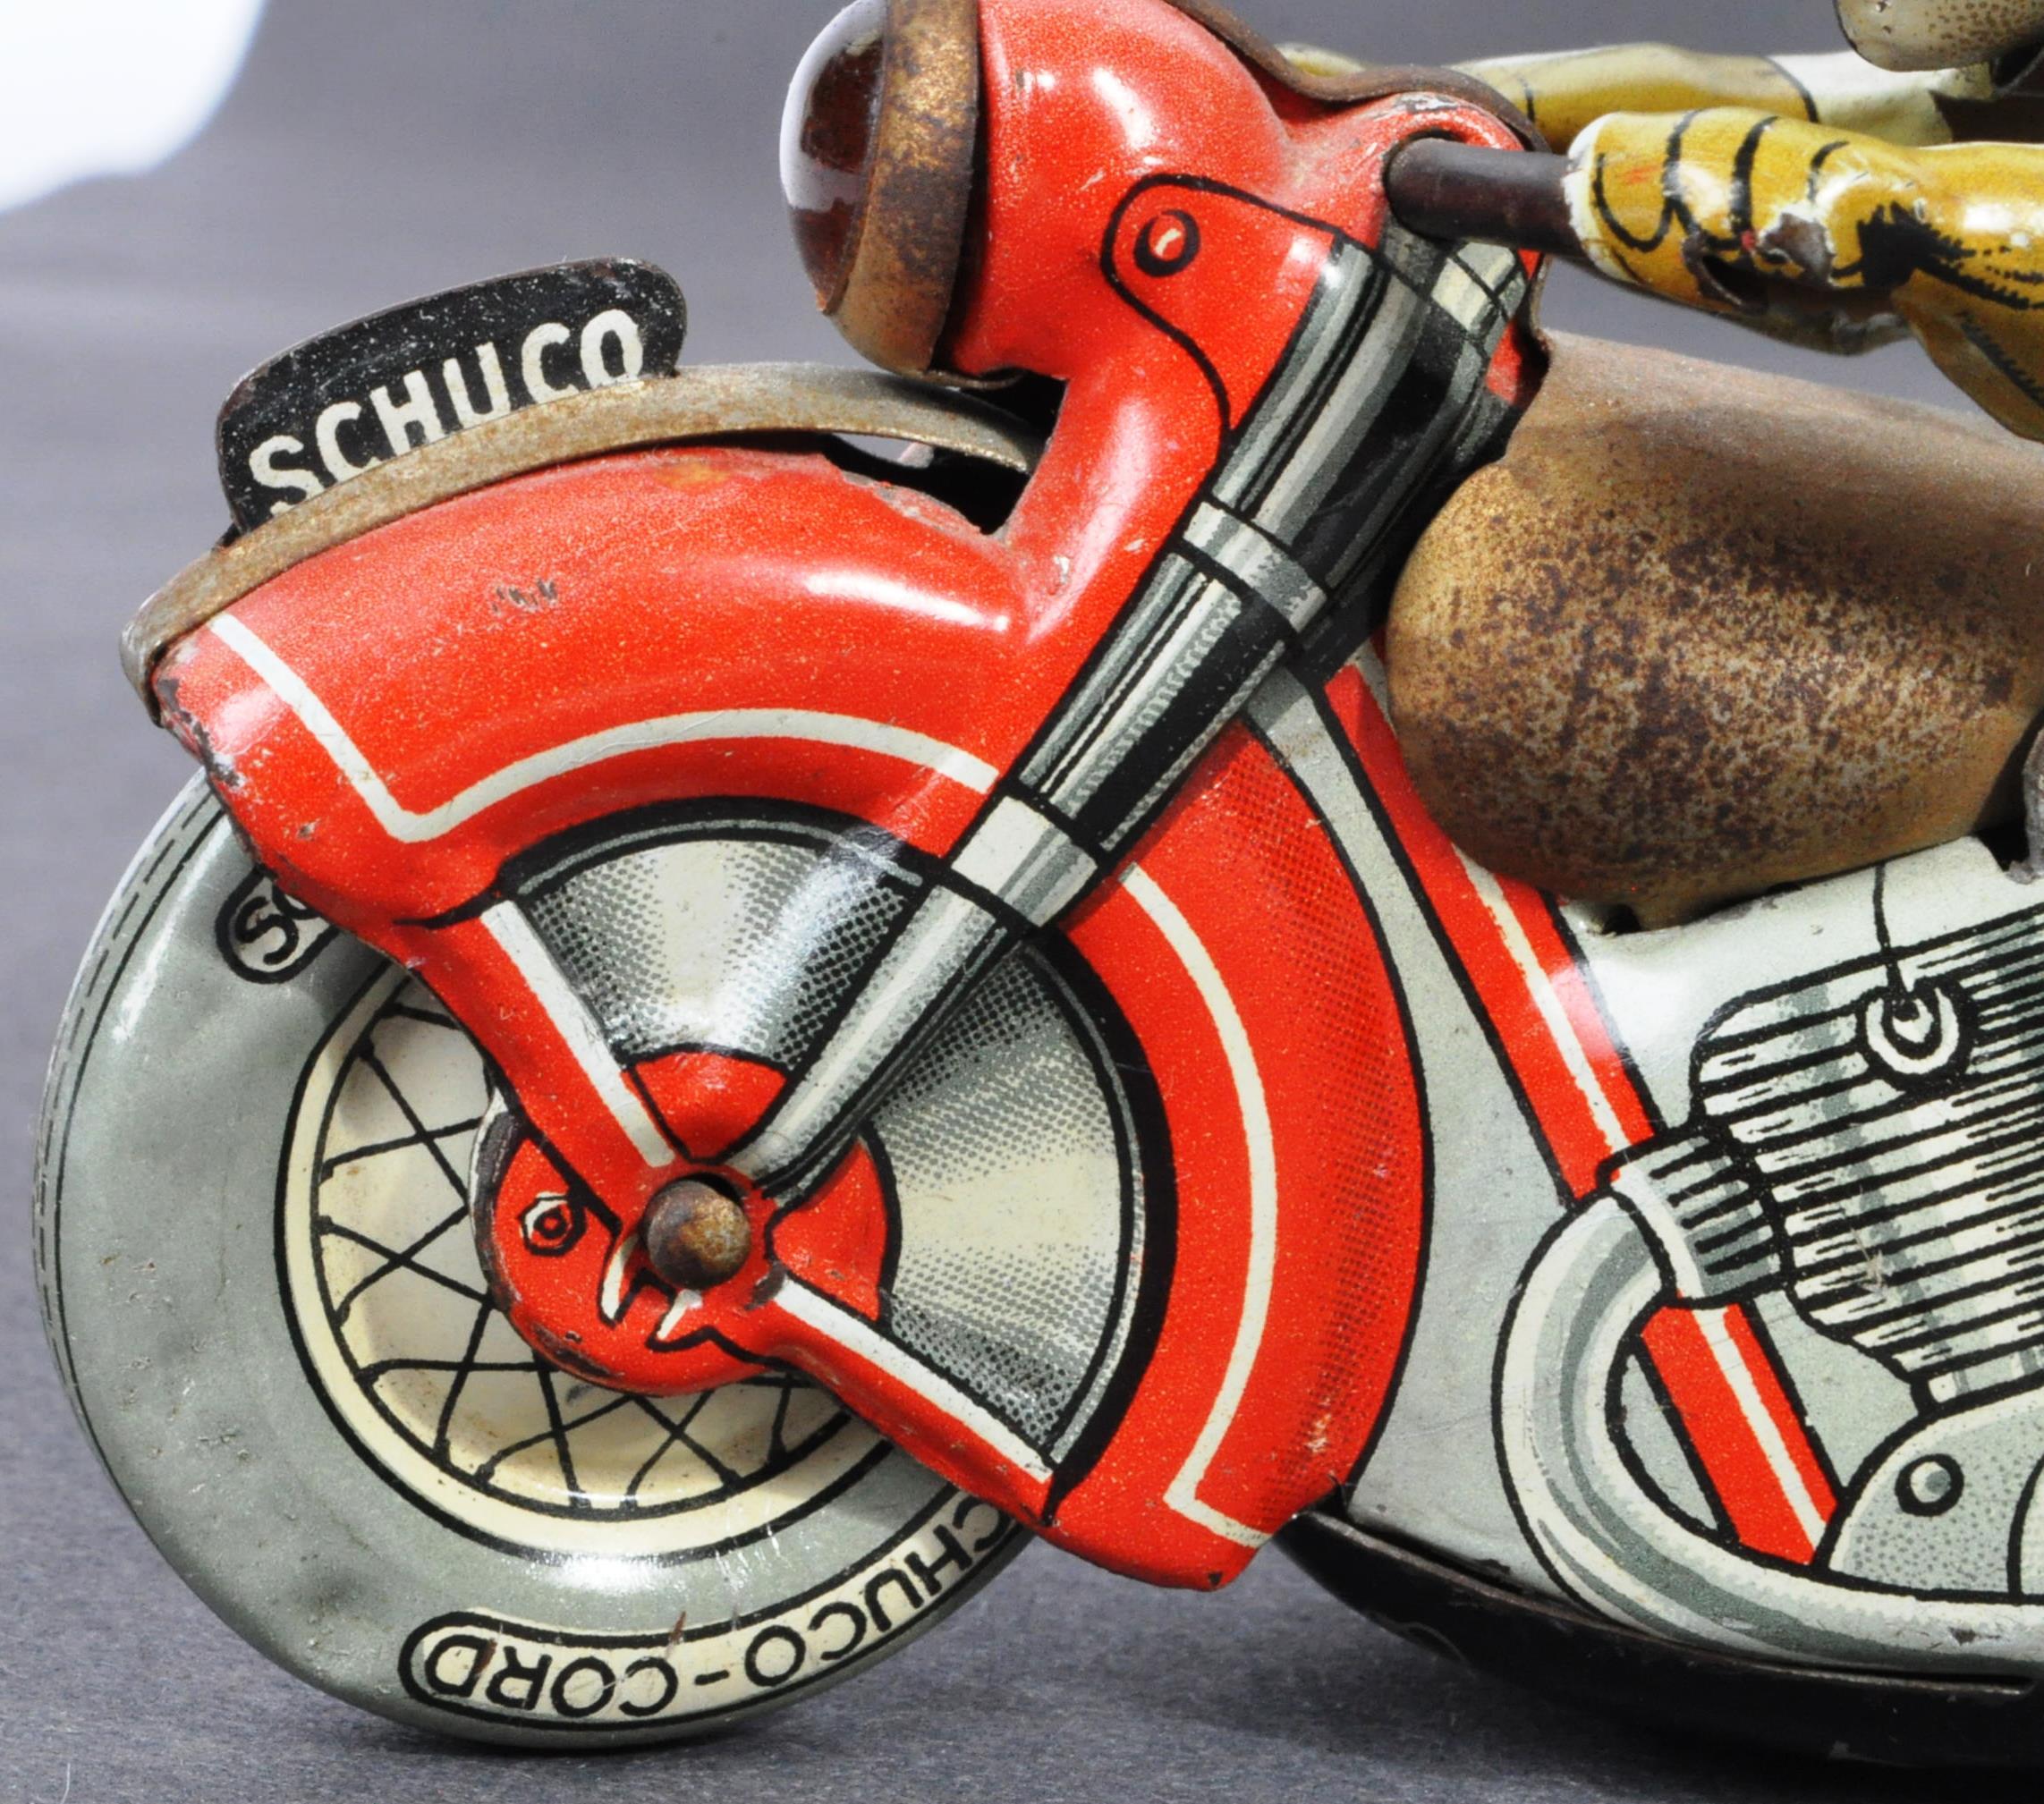 ORIGINAL VINTAGE SCHUCO TINPLATE RACING MOTORCYCLE - Image 7 of 8